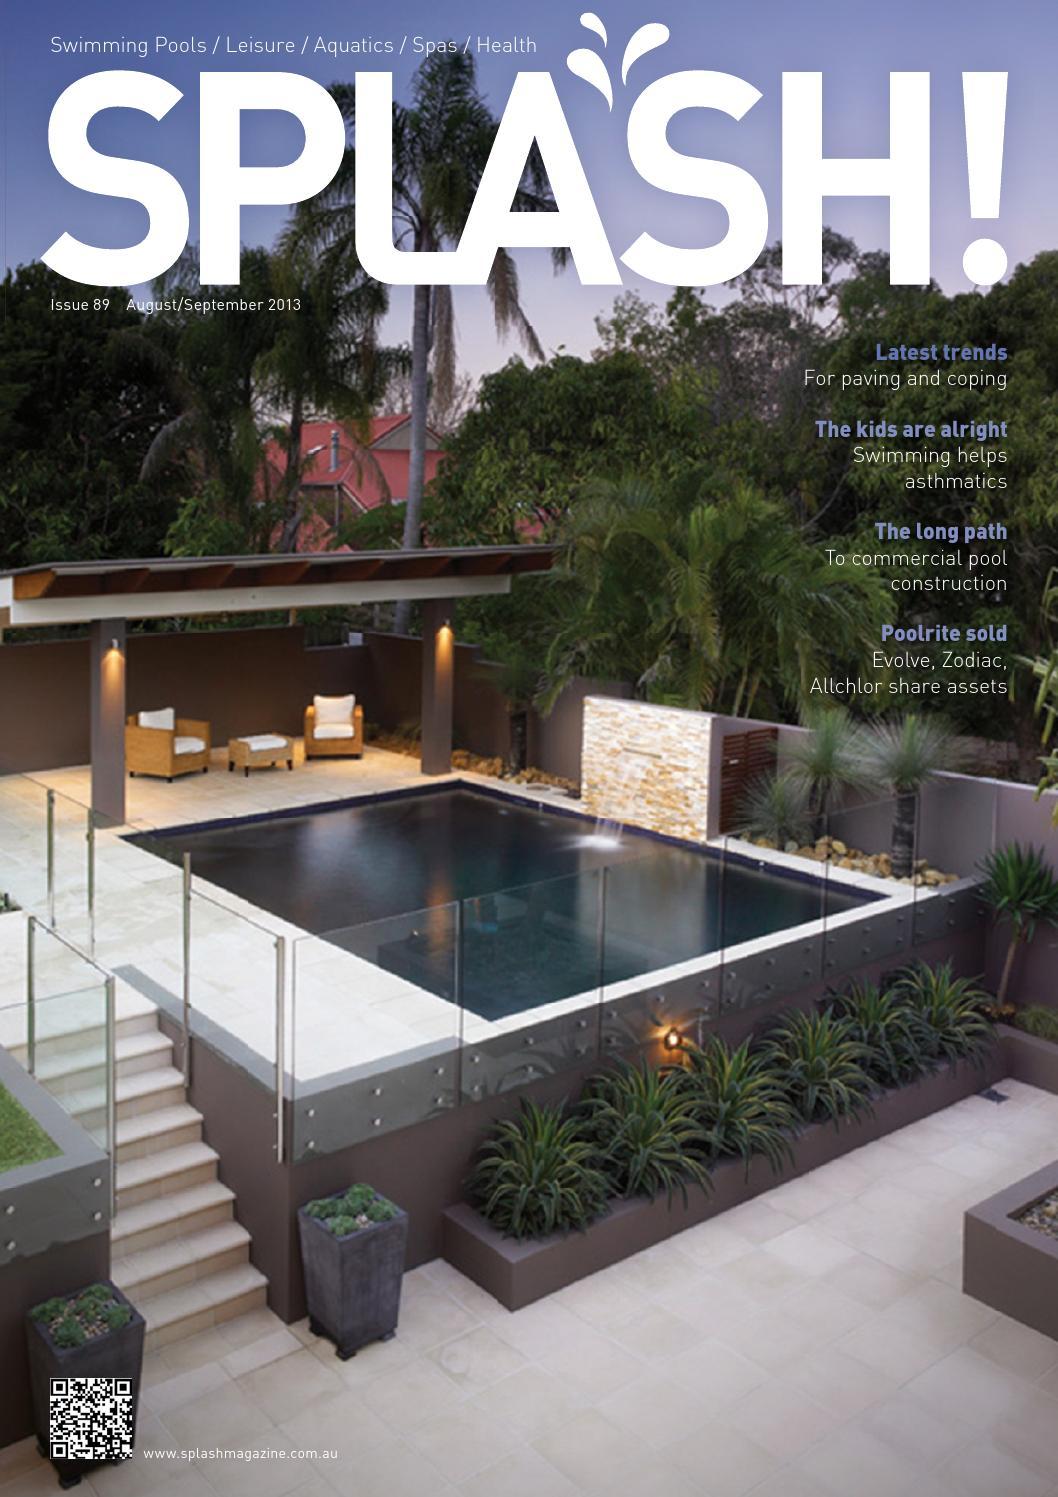 Splash August September 2013 by The Intermedia Group - issuu